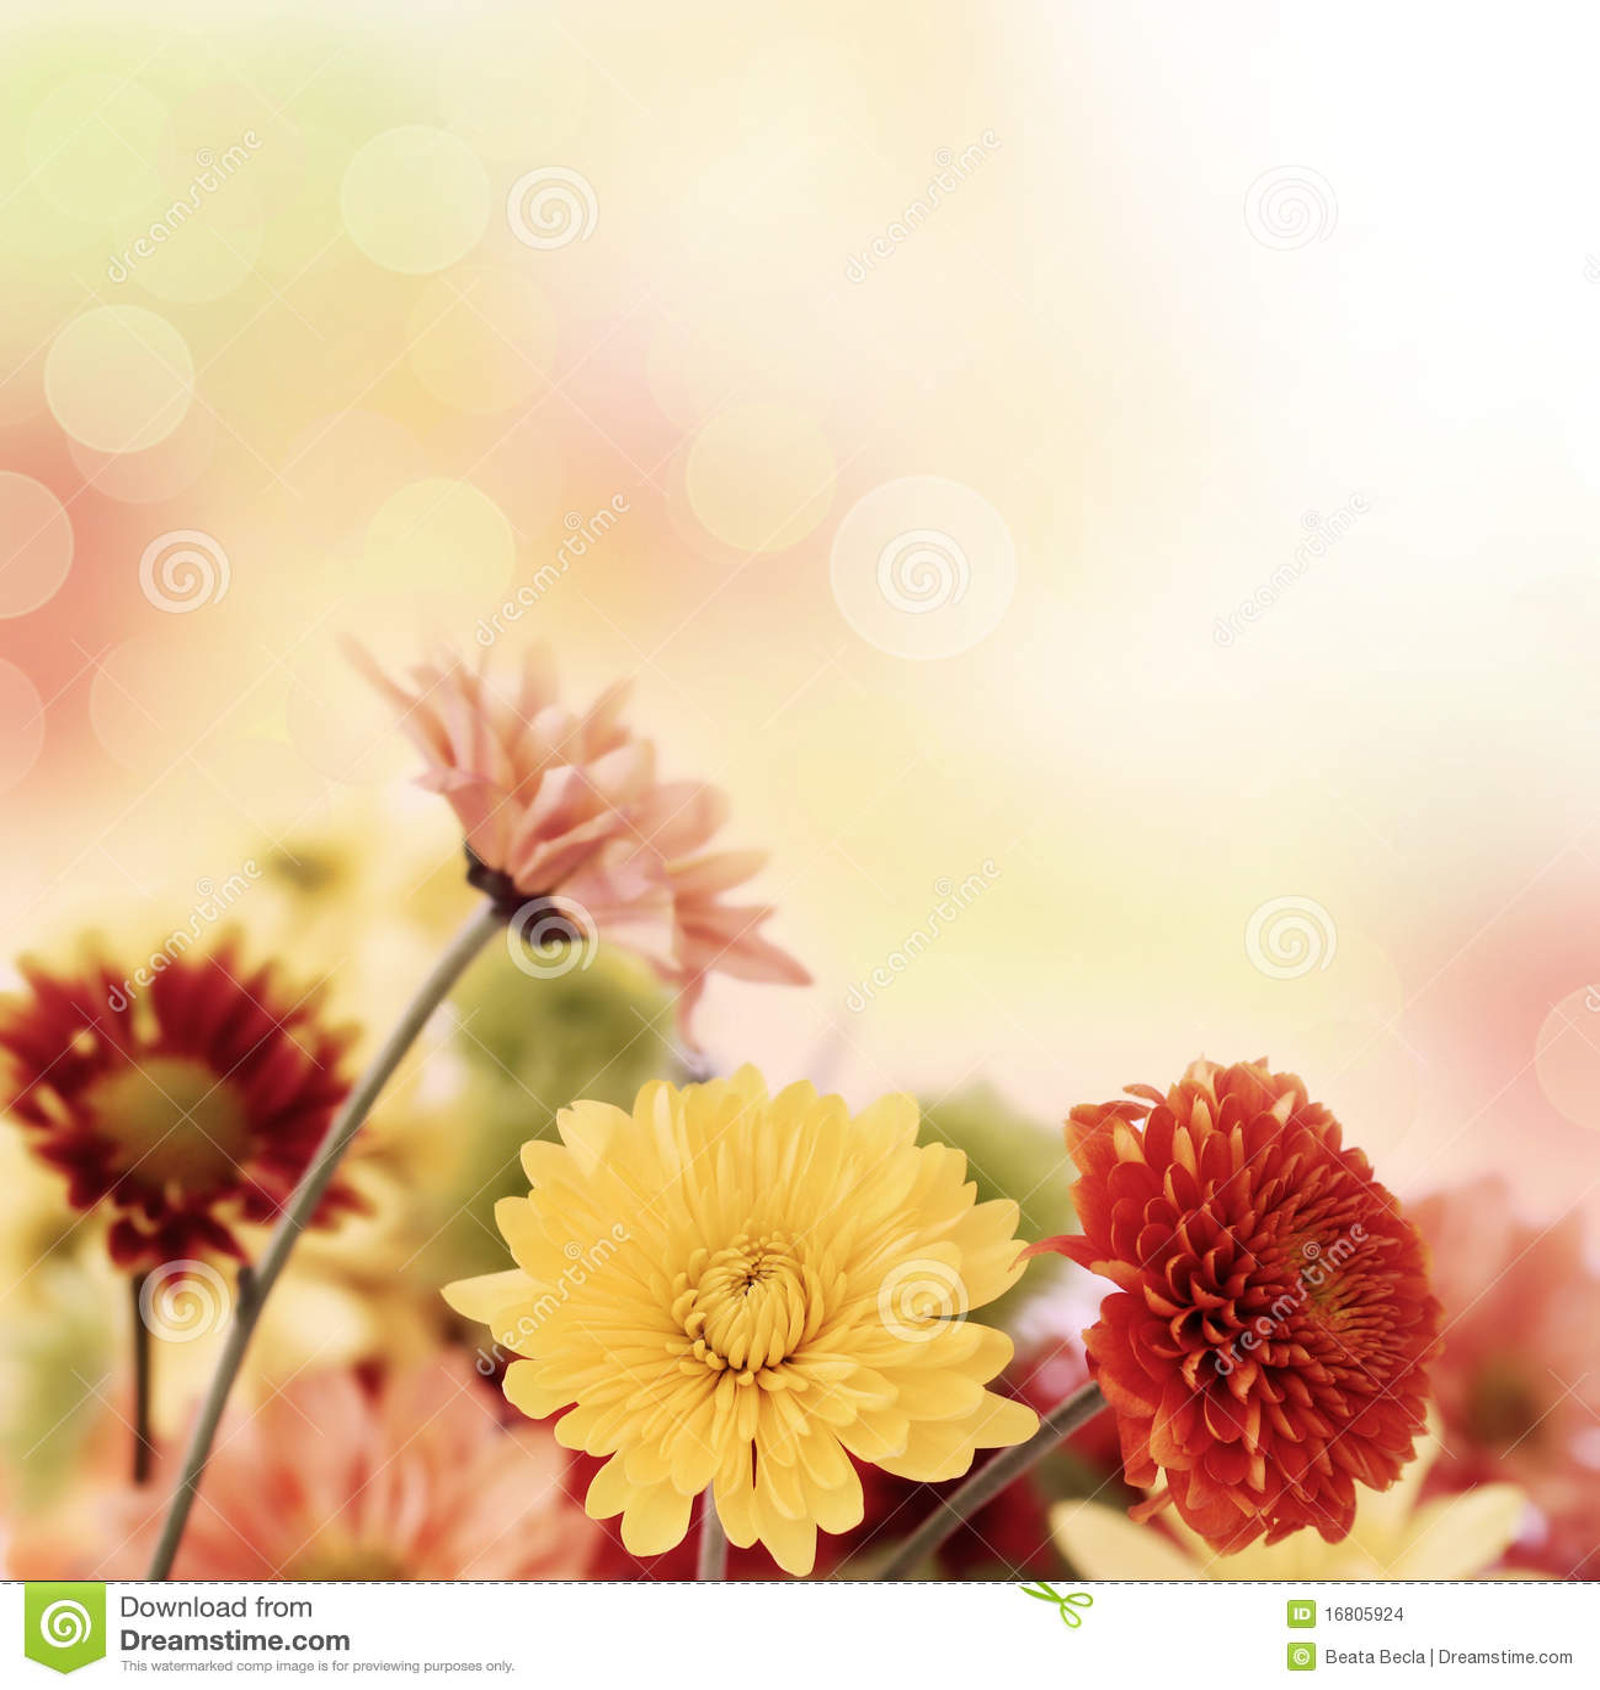 Pretty Fall Desktop Wallpaper Colorful Mums Flowers On Warm Bokeh Background Stock